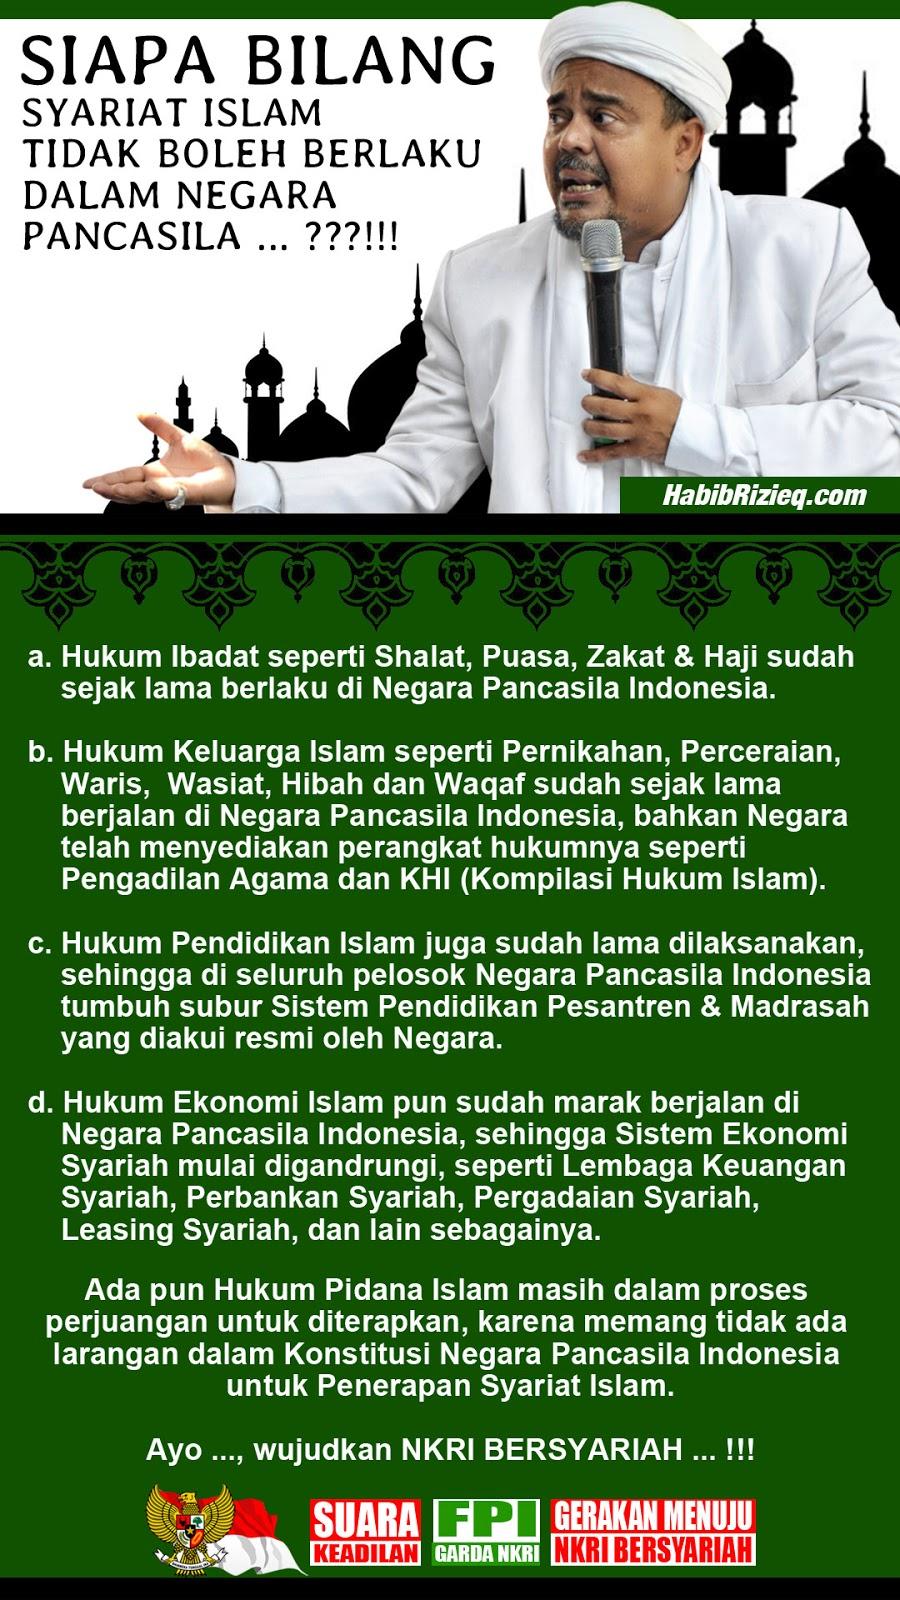 Umar Abdul Aziz Google